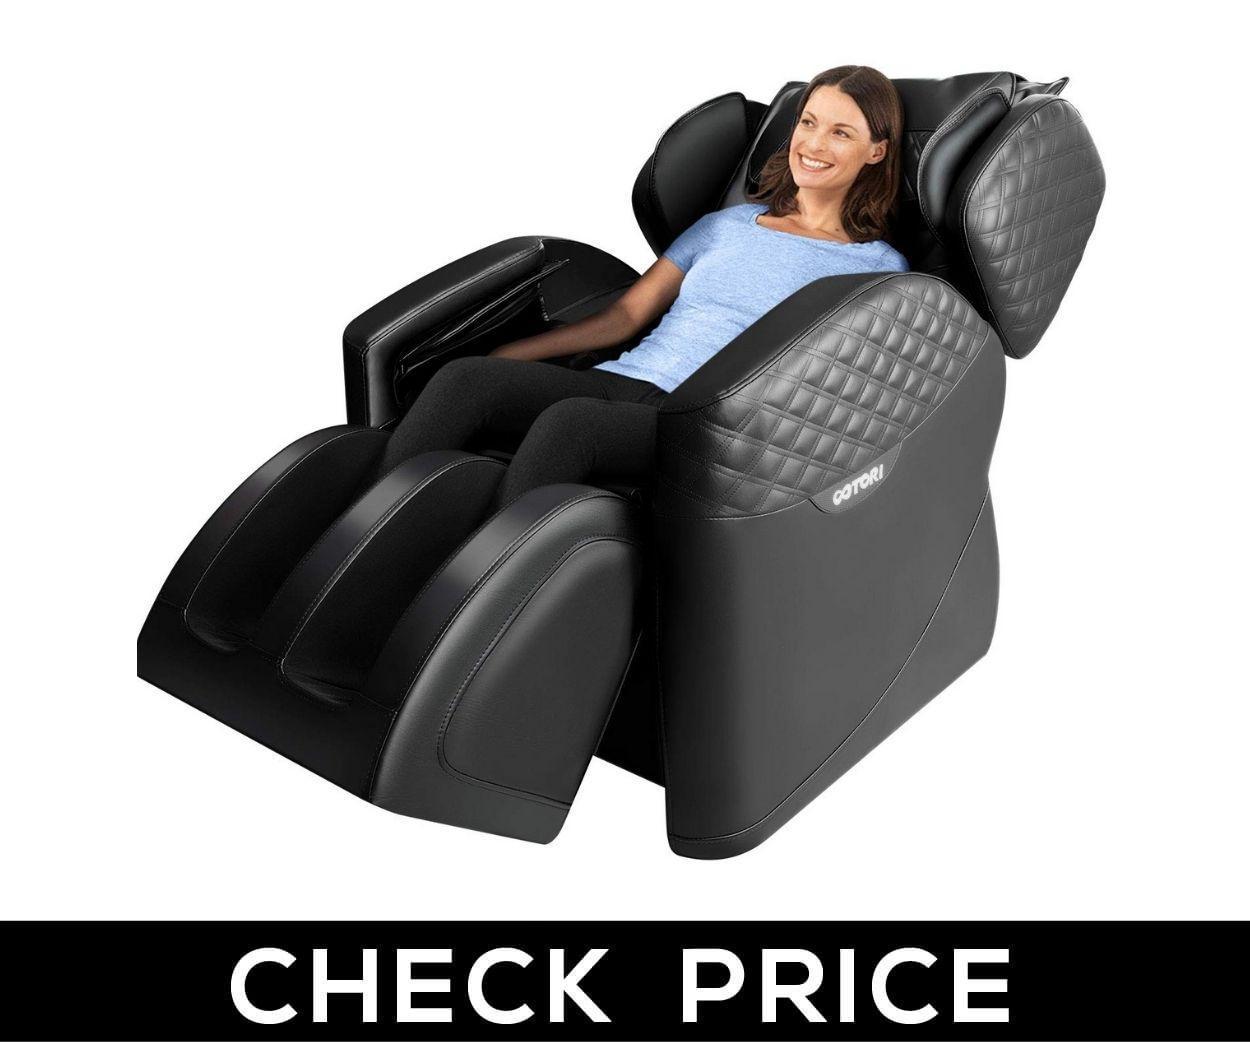 Lernonl – Best Full Body Massage Chair